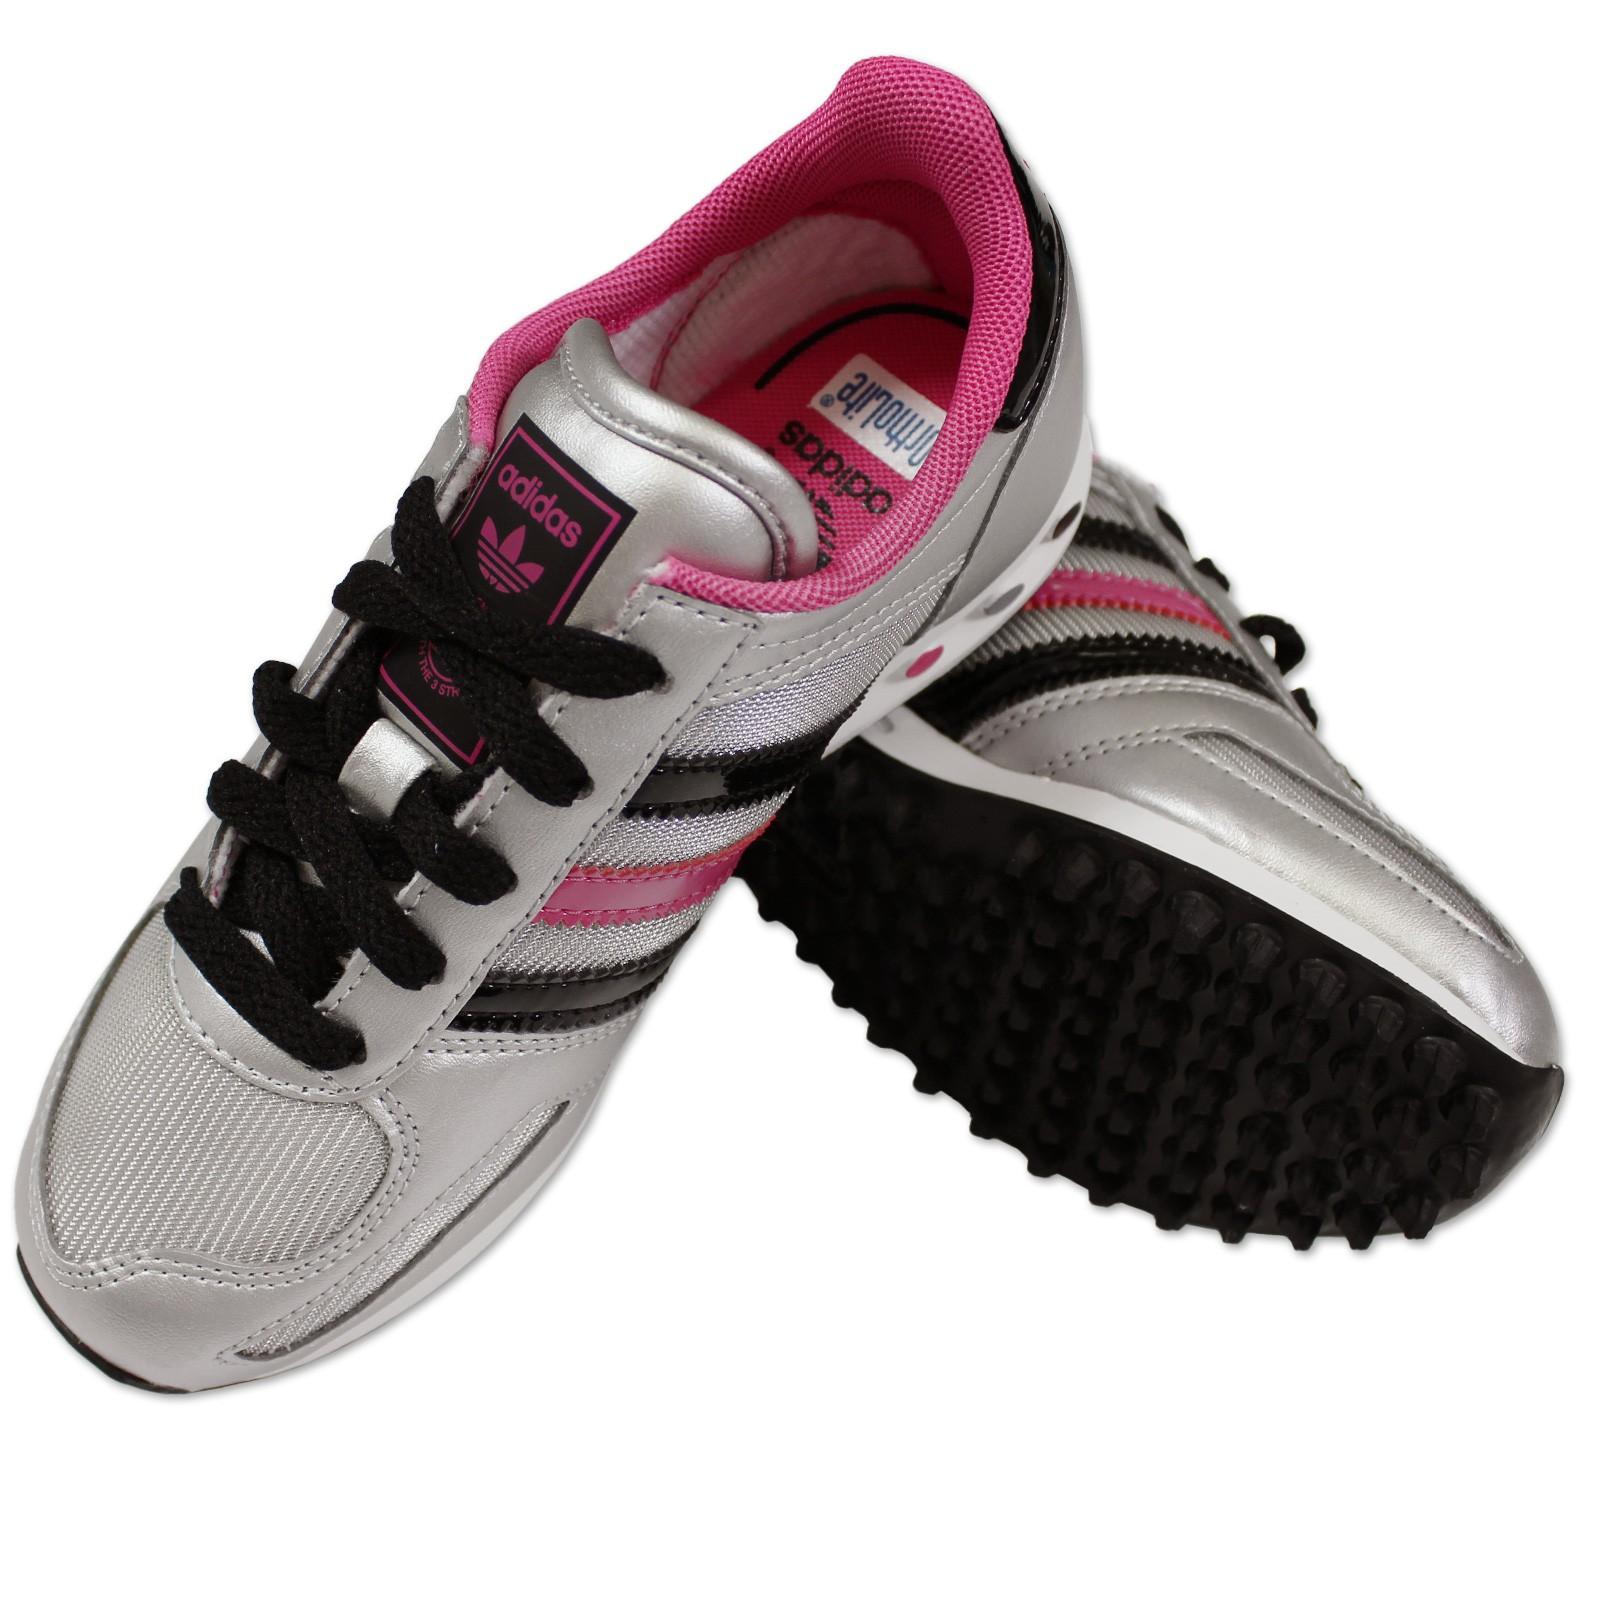 adidas originals vettura bambina scarpe sneaker argento. Black Bedroom Furniture Sets. Home Design Ideas